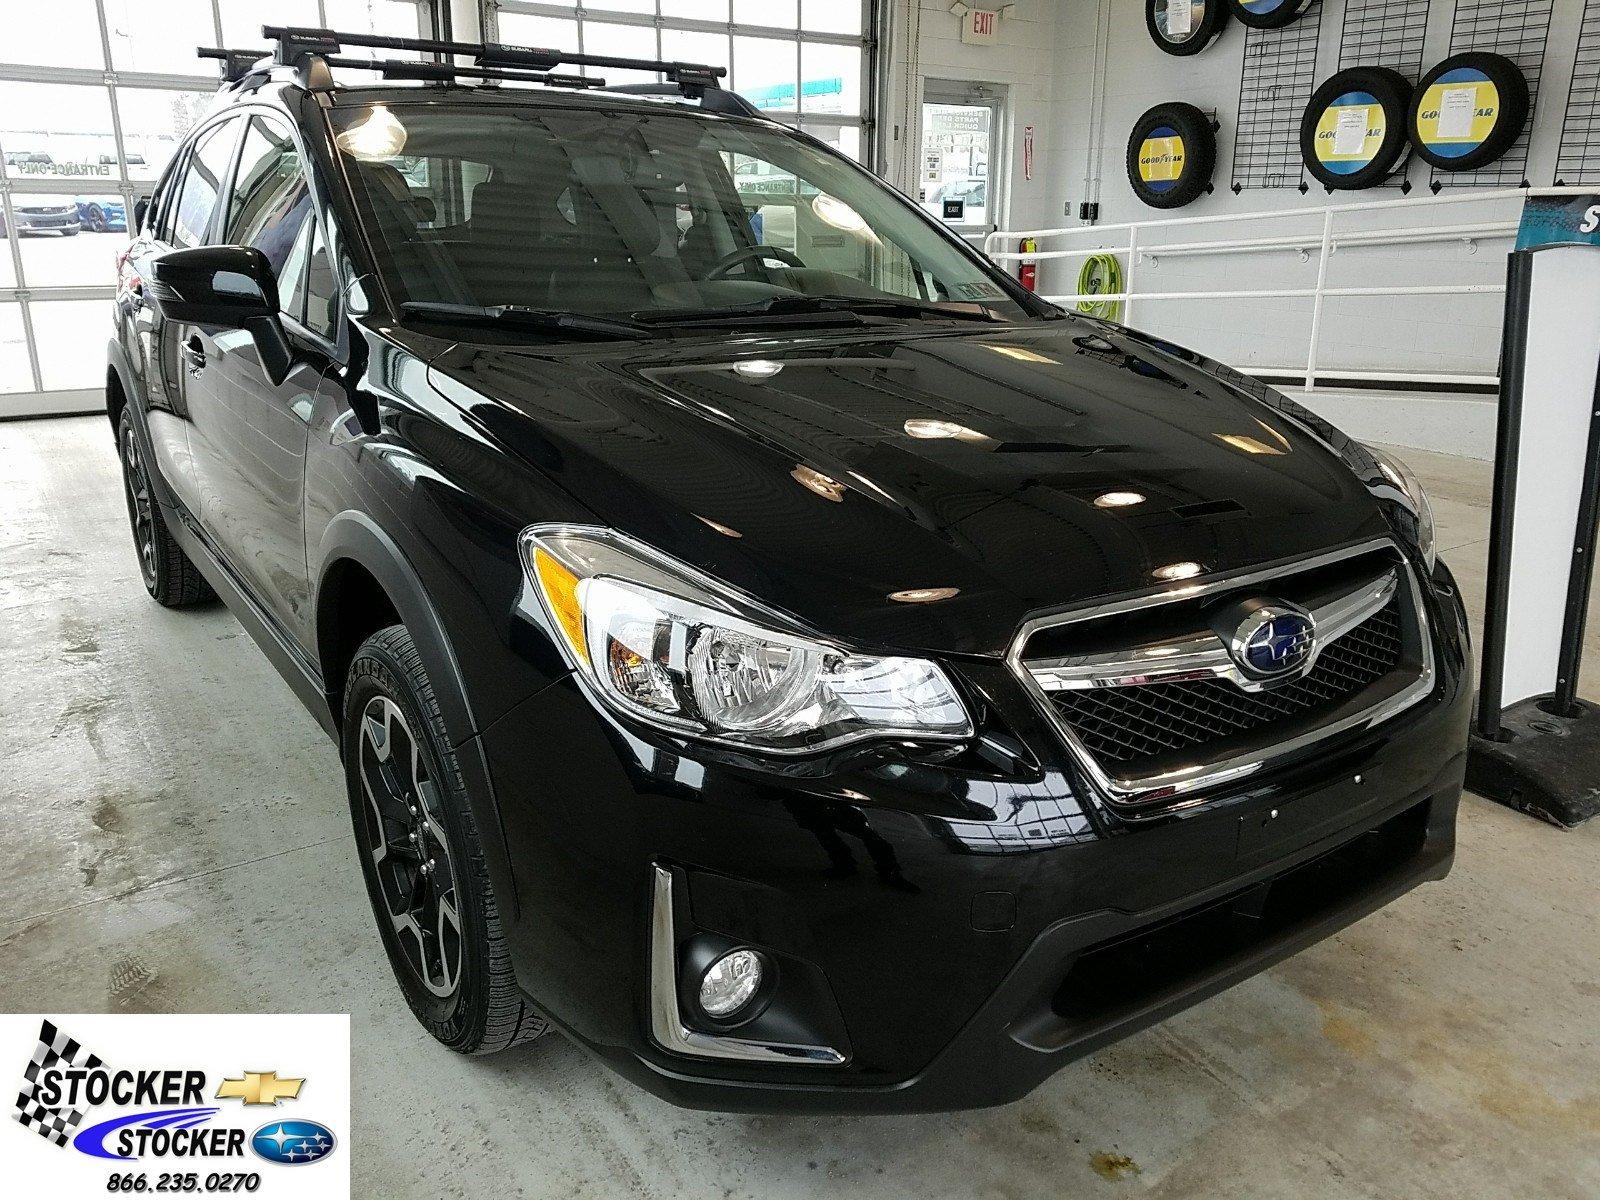 2016 Subaru Crosstrek 2.0i Limited SUV for sale in State College, PA